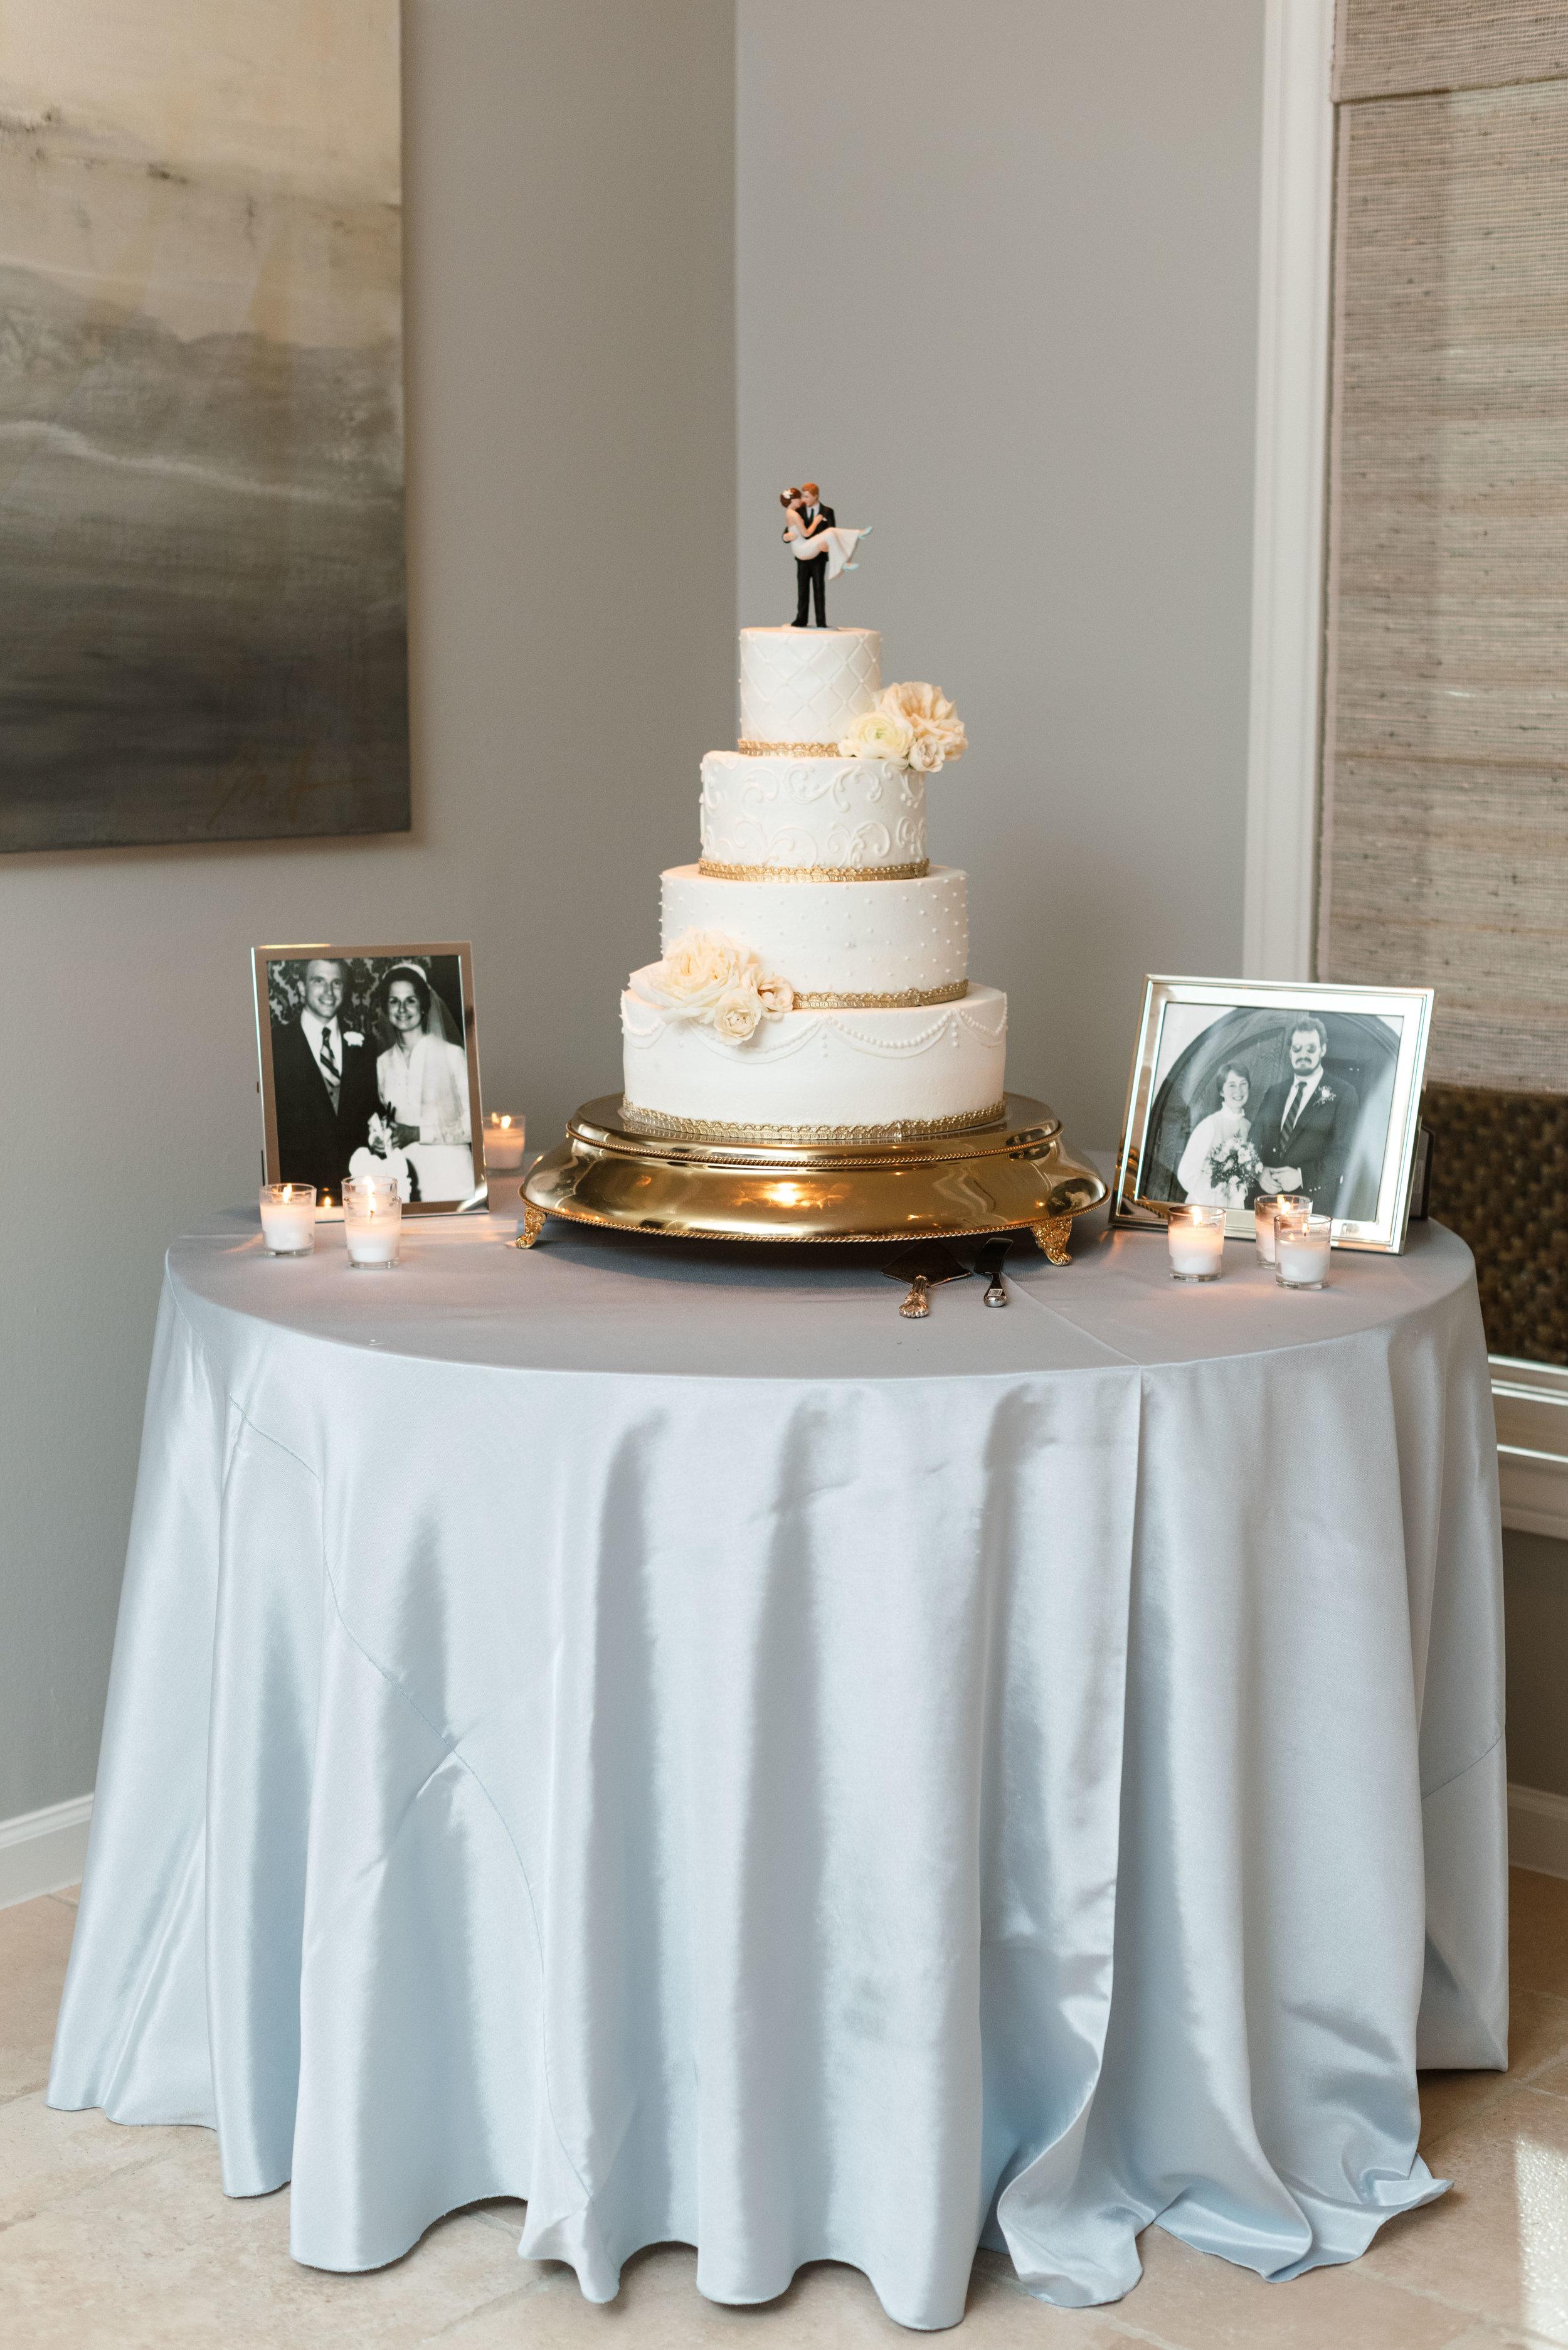 Who made the cake | Classic Wedding Cake Houston